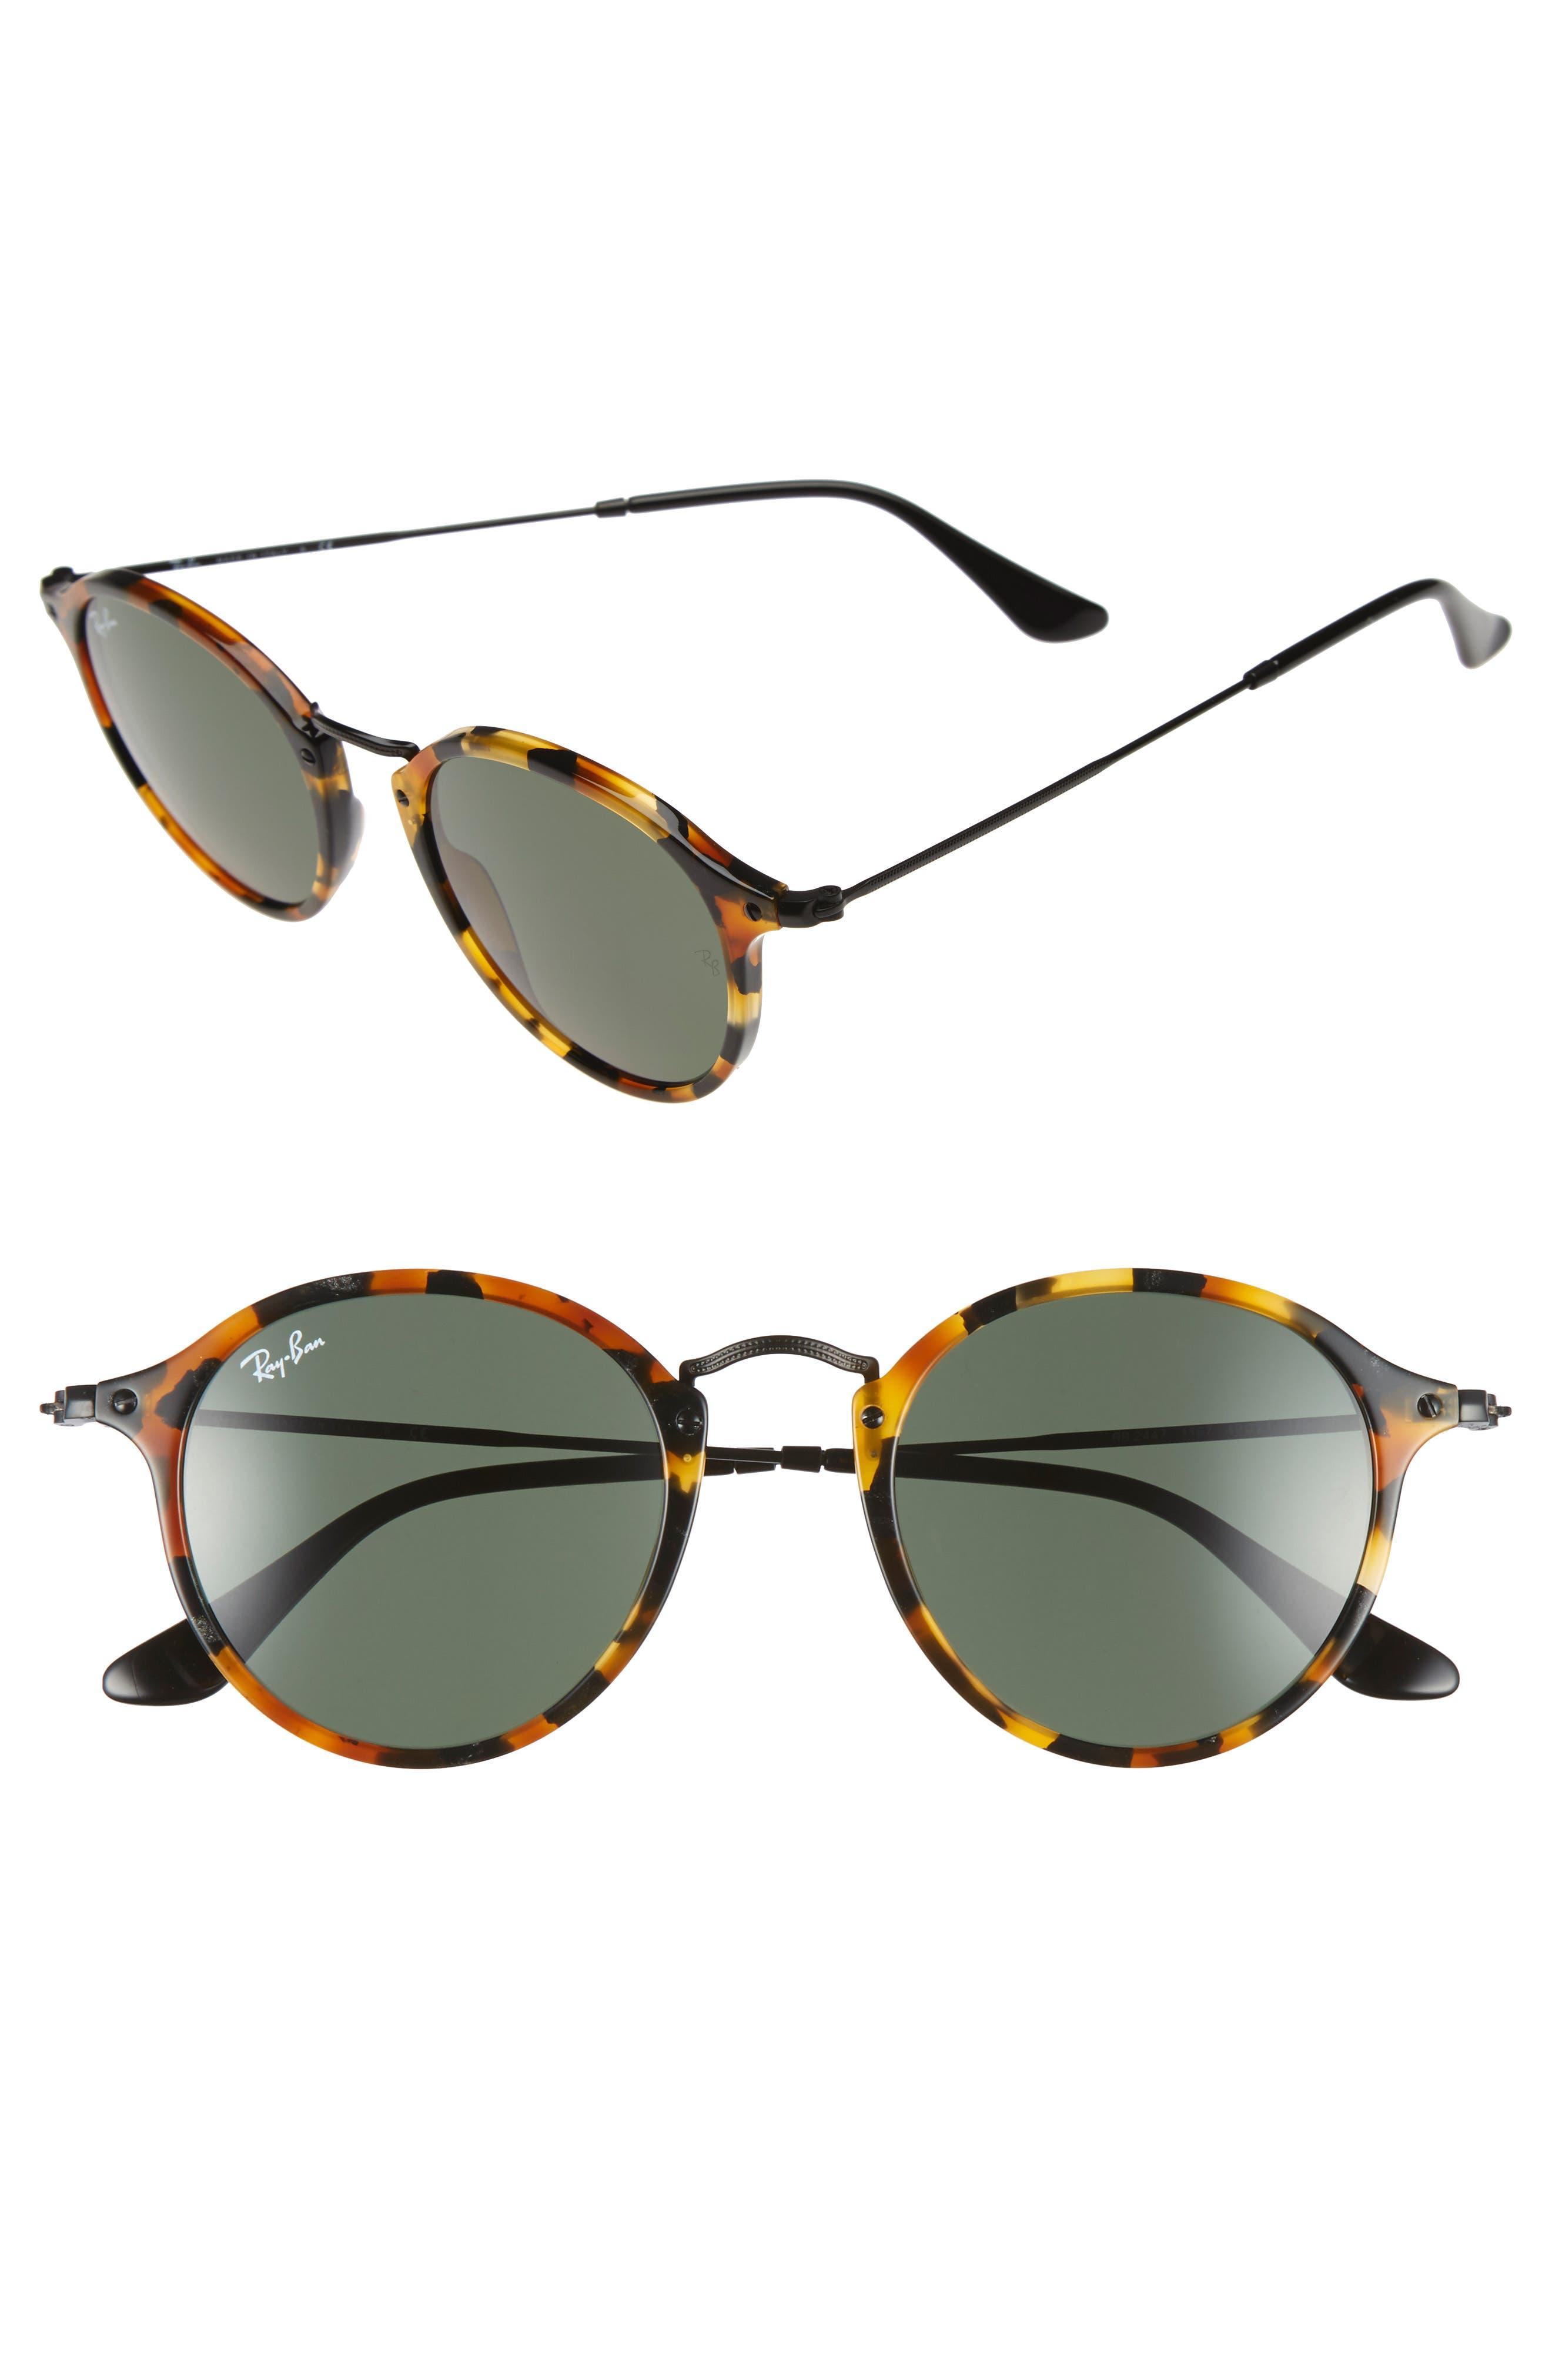 49mm Retro Sunglasses,                         Main,                         color, SPOTTED BLACK HAVANA/ GREEN